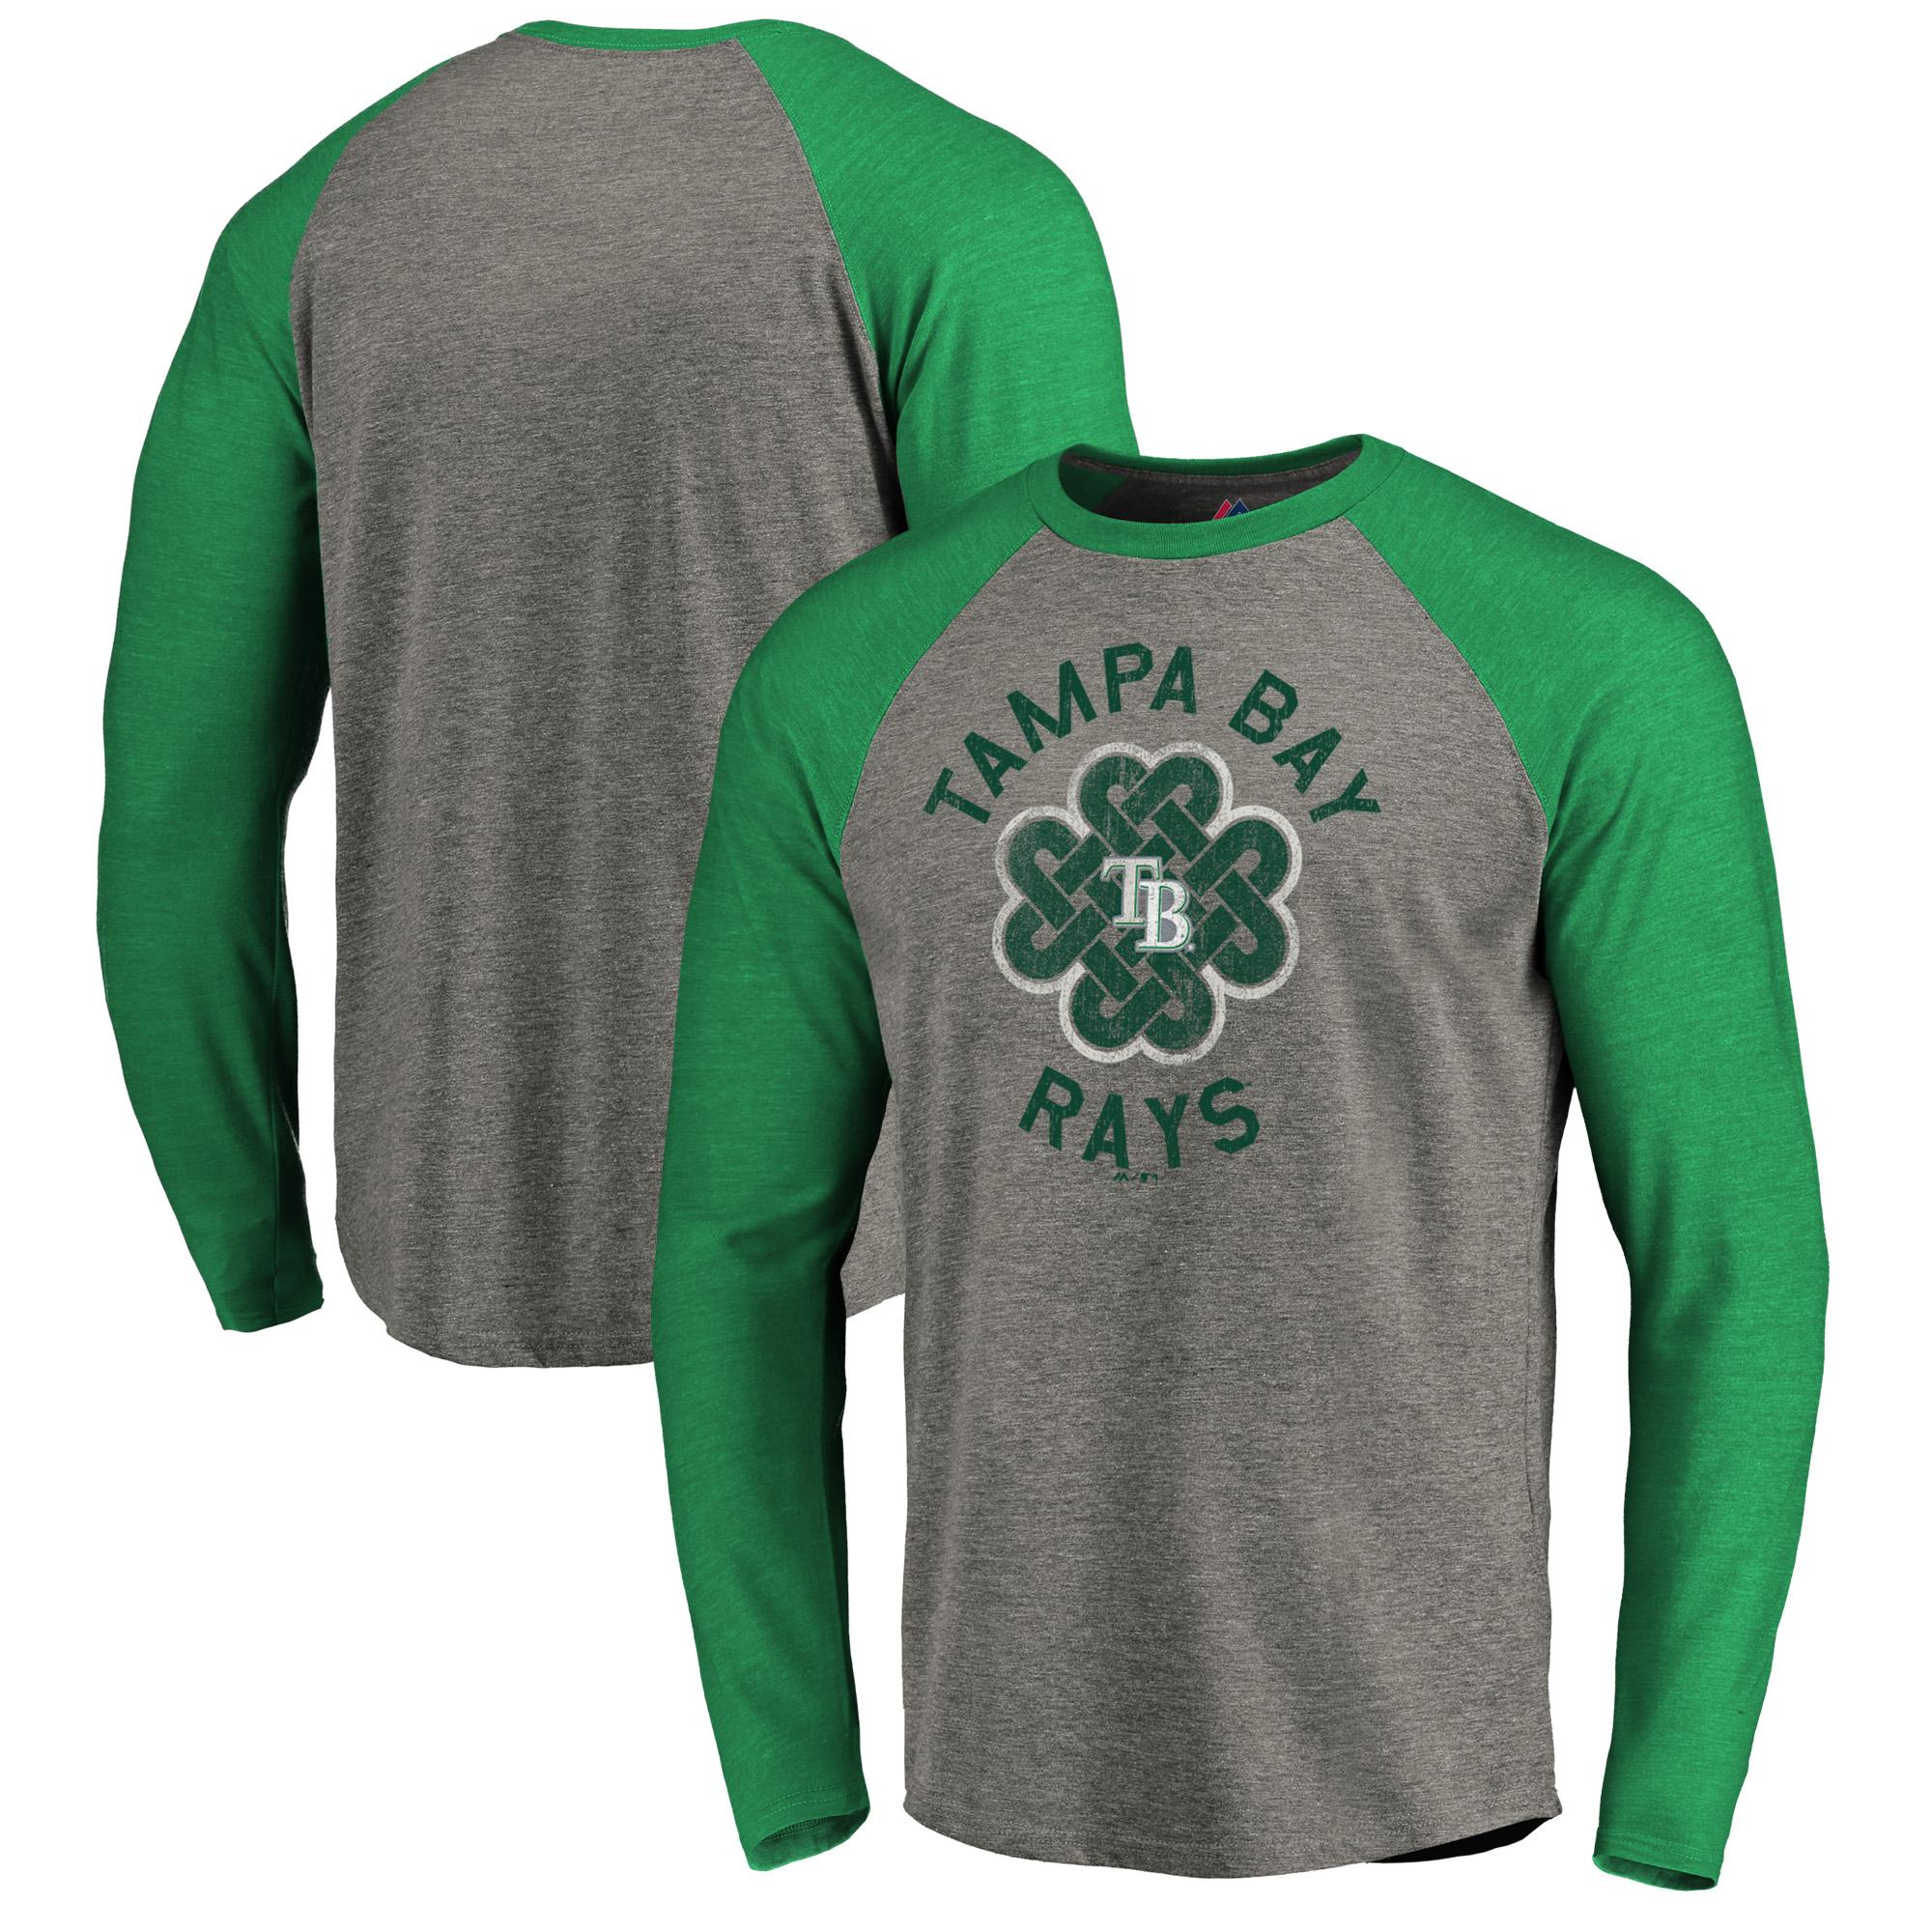 Tampa Bay Rays Majestic Luck Tradition Long Sleeve Tri-Blend Raglan T-Shirt - Heathered Gray